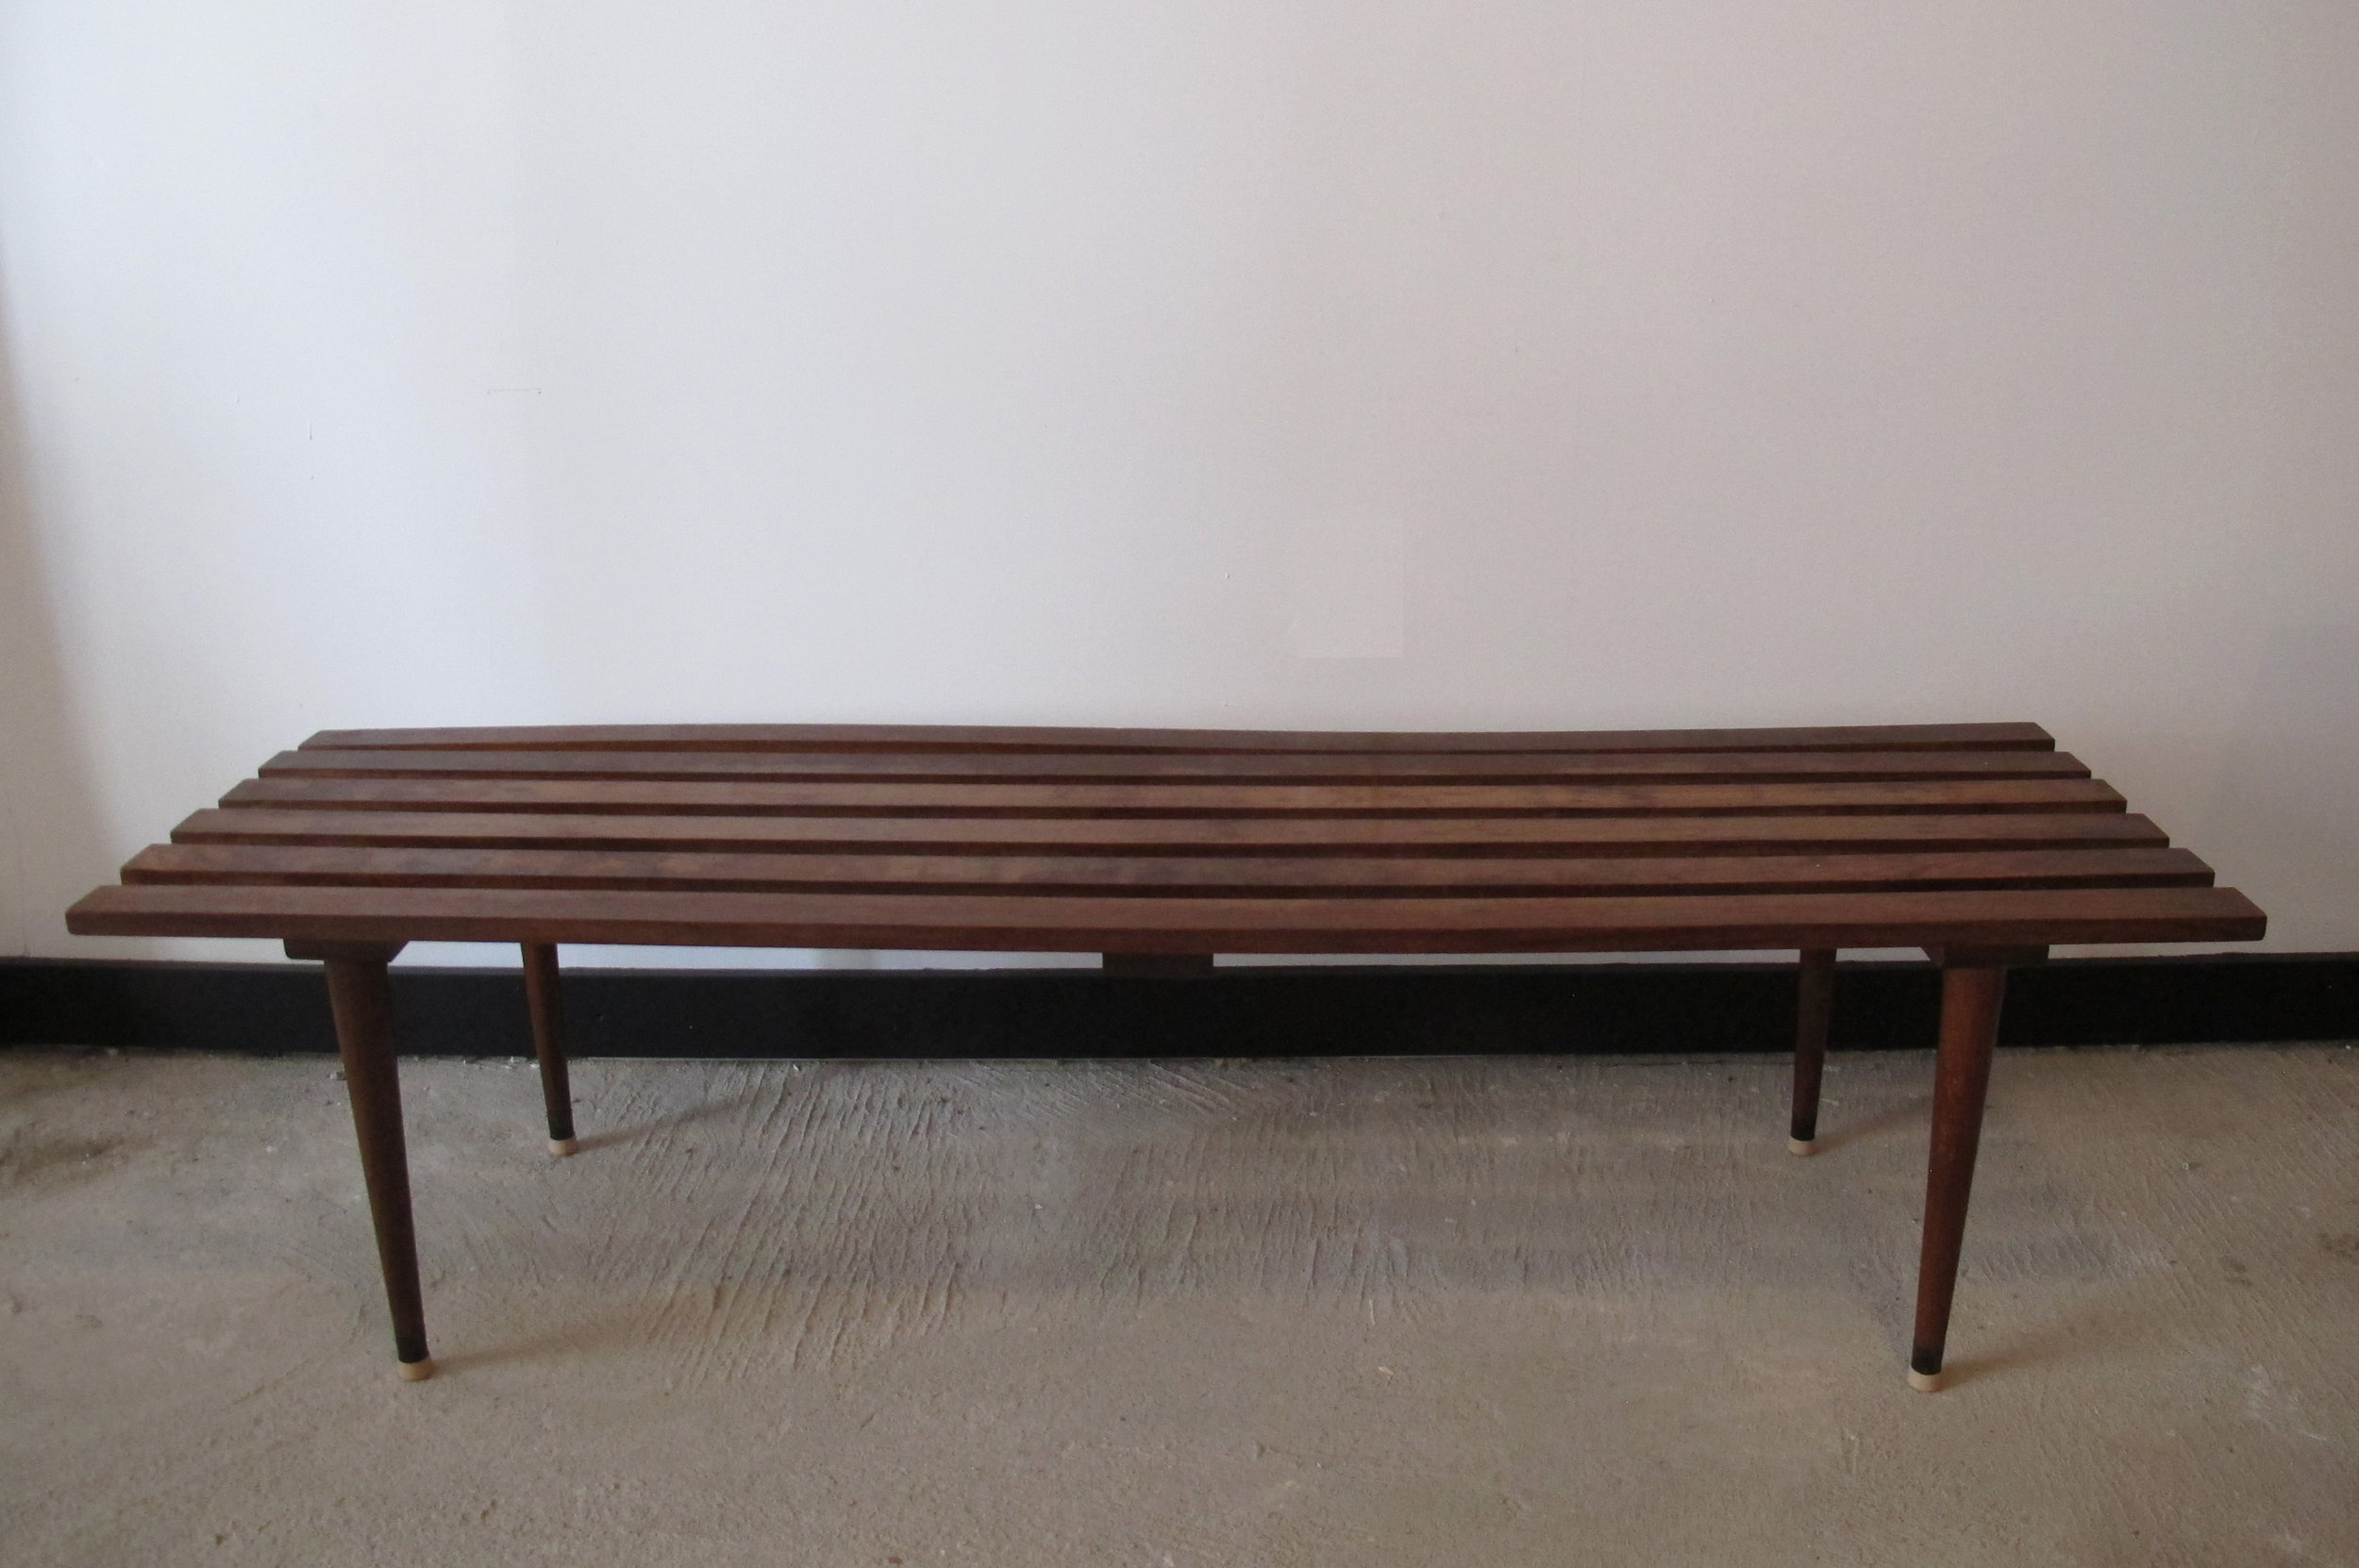 MID CENTURY FIVE-FOOT SLAT BENCH